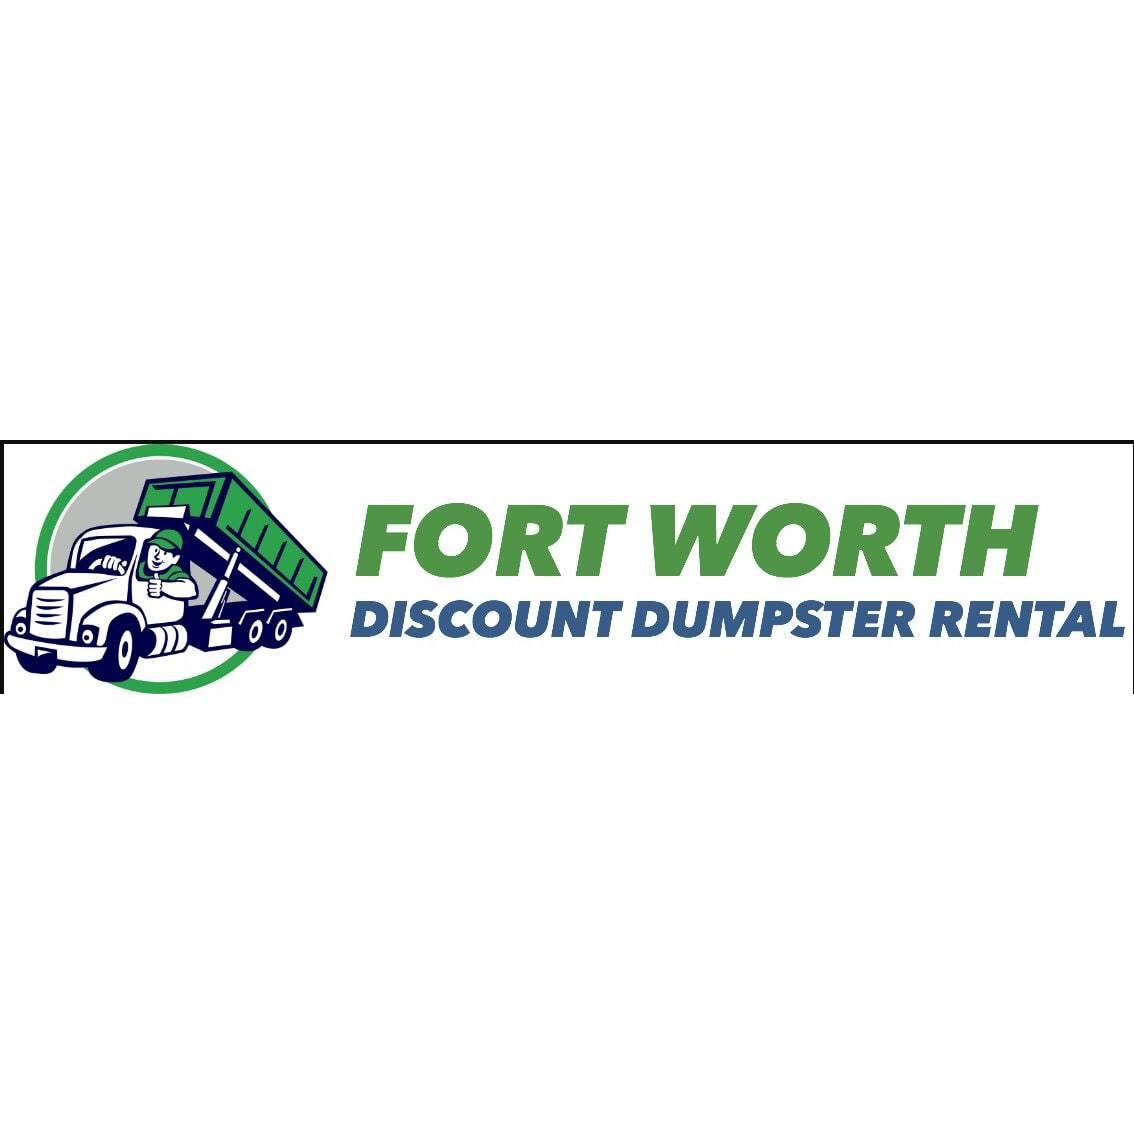 Discount Dumpster Rental Fort Worth